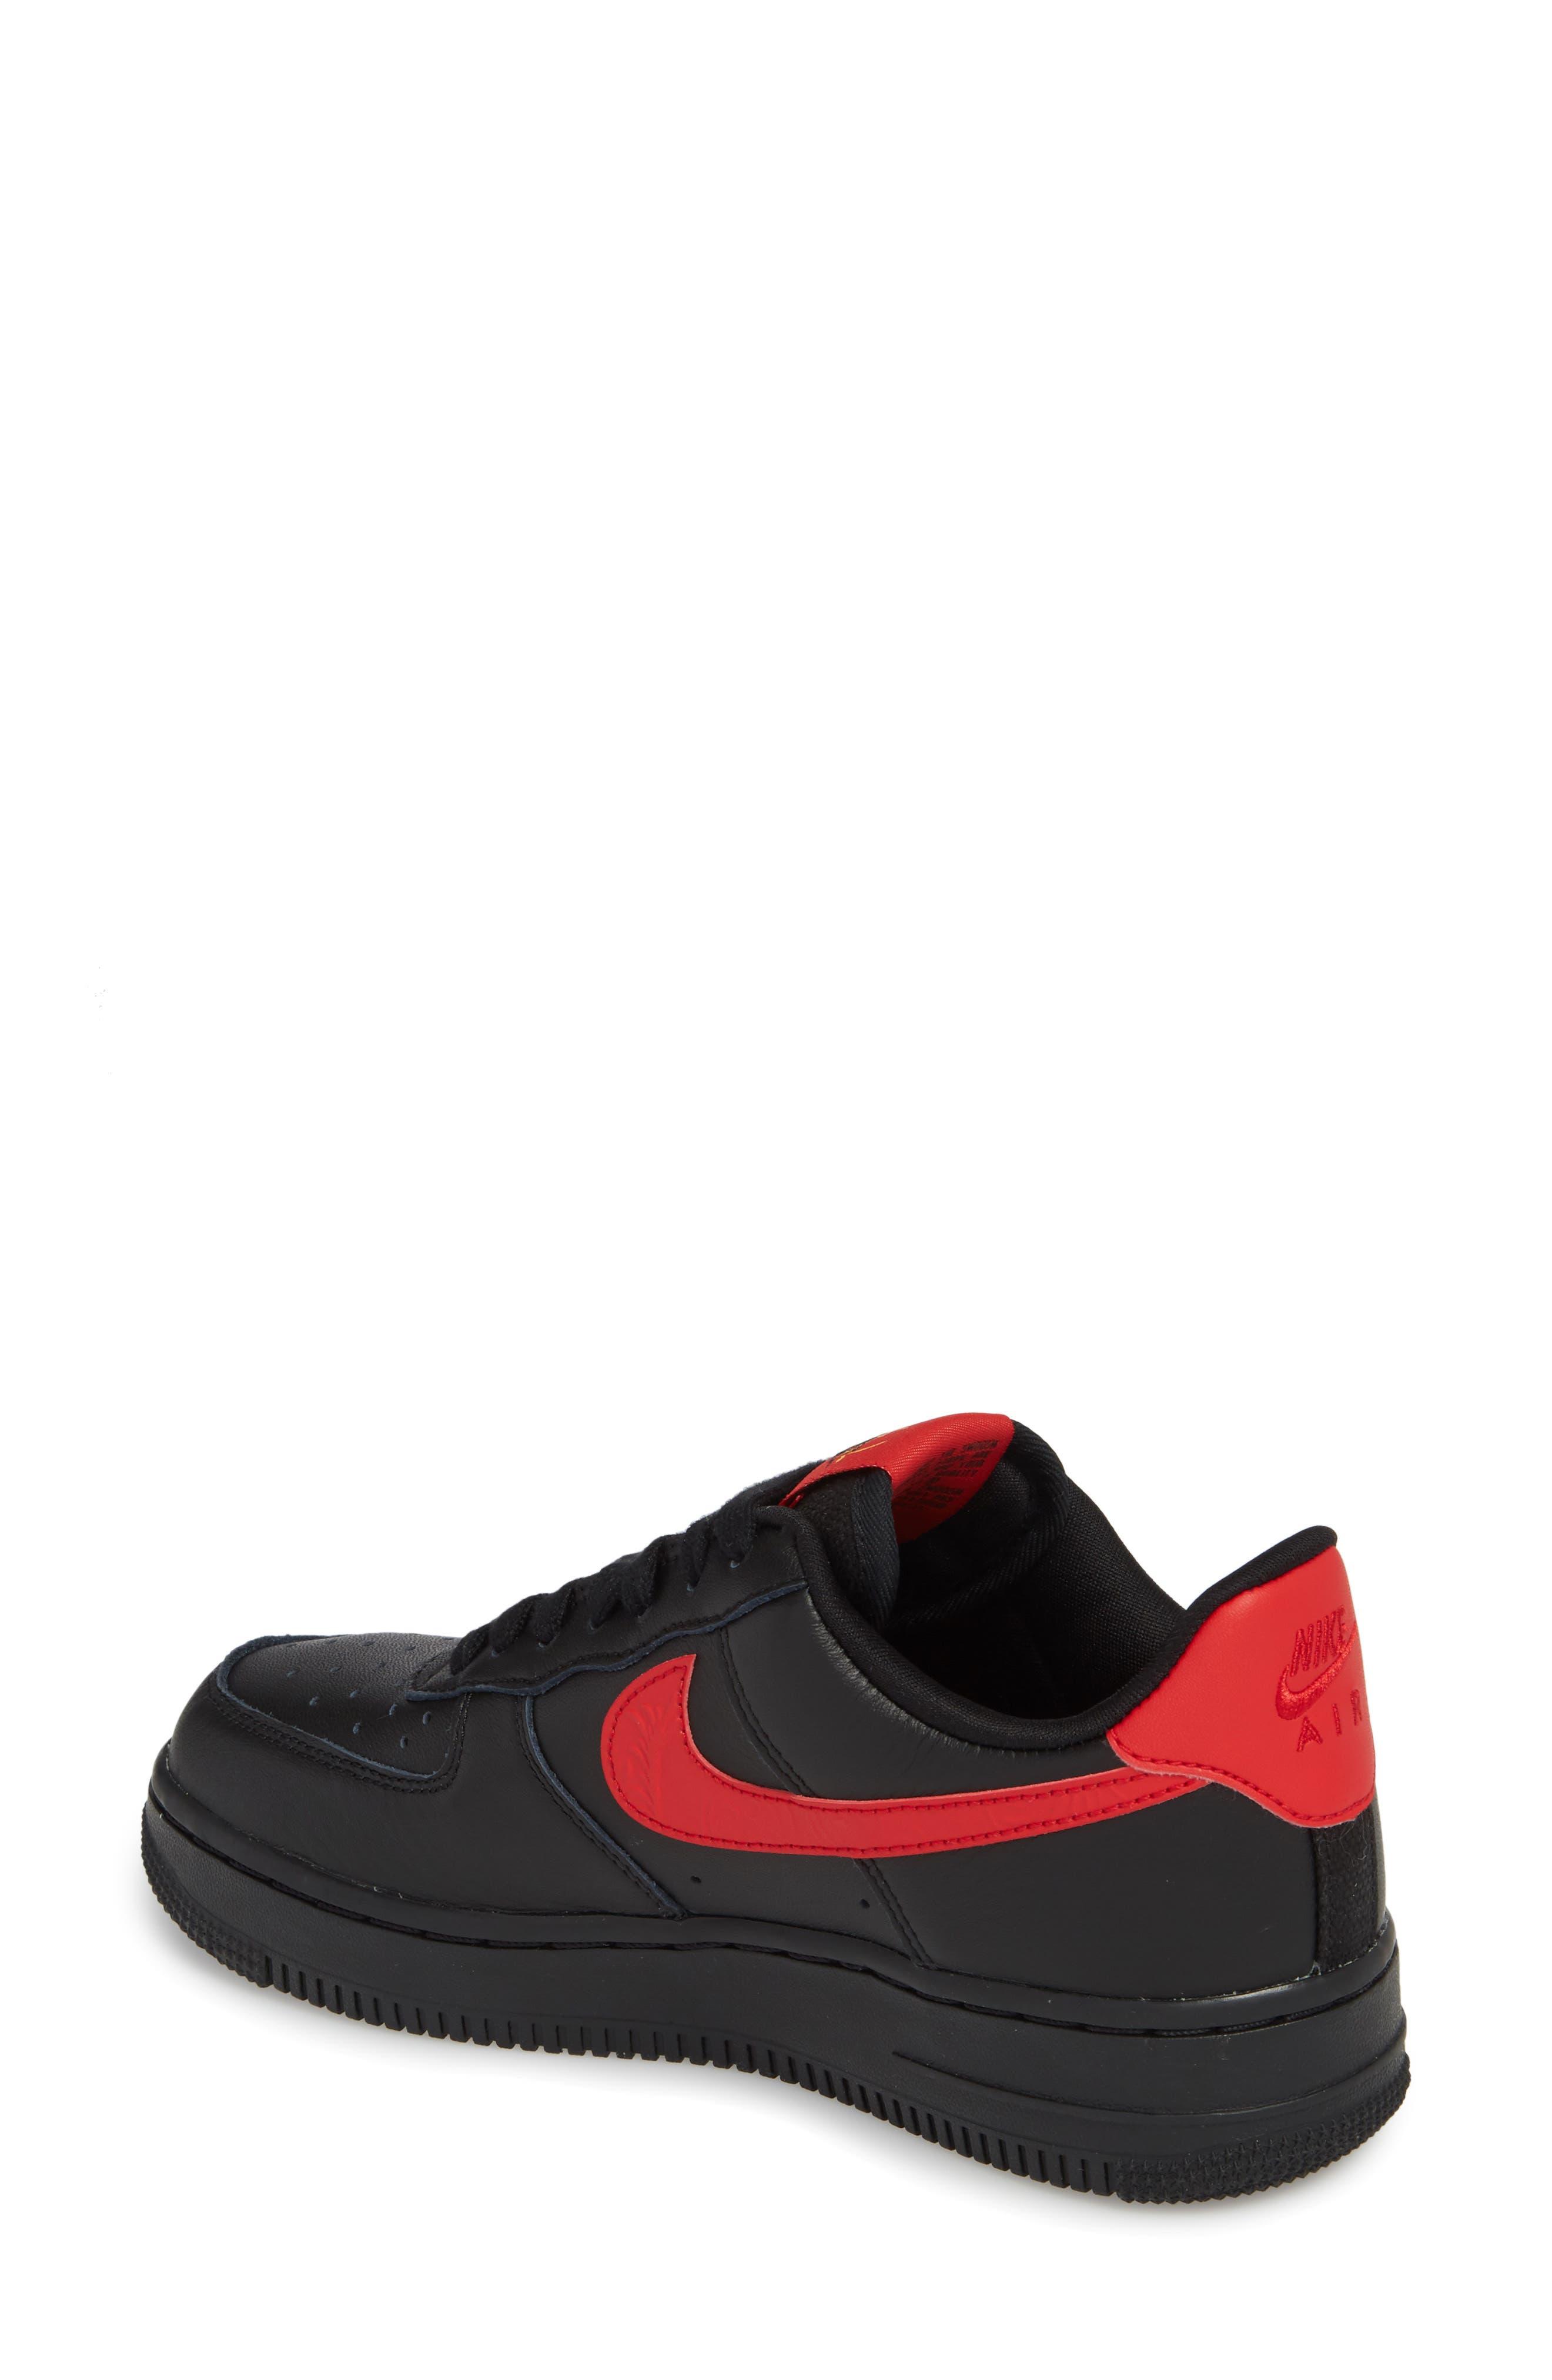 Air Force 1 '07 Sneaker,                             Alternate thumbnail 2, color,                             001